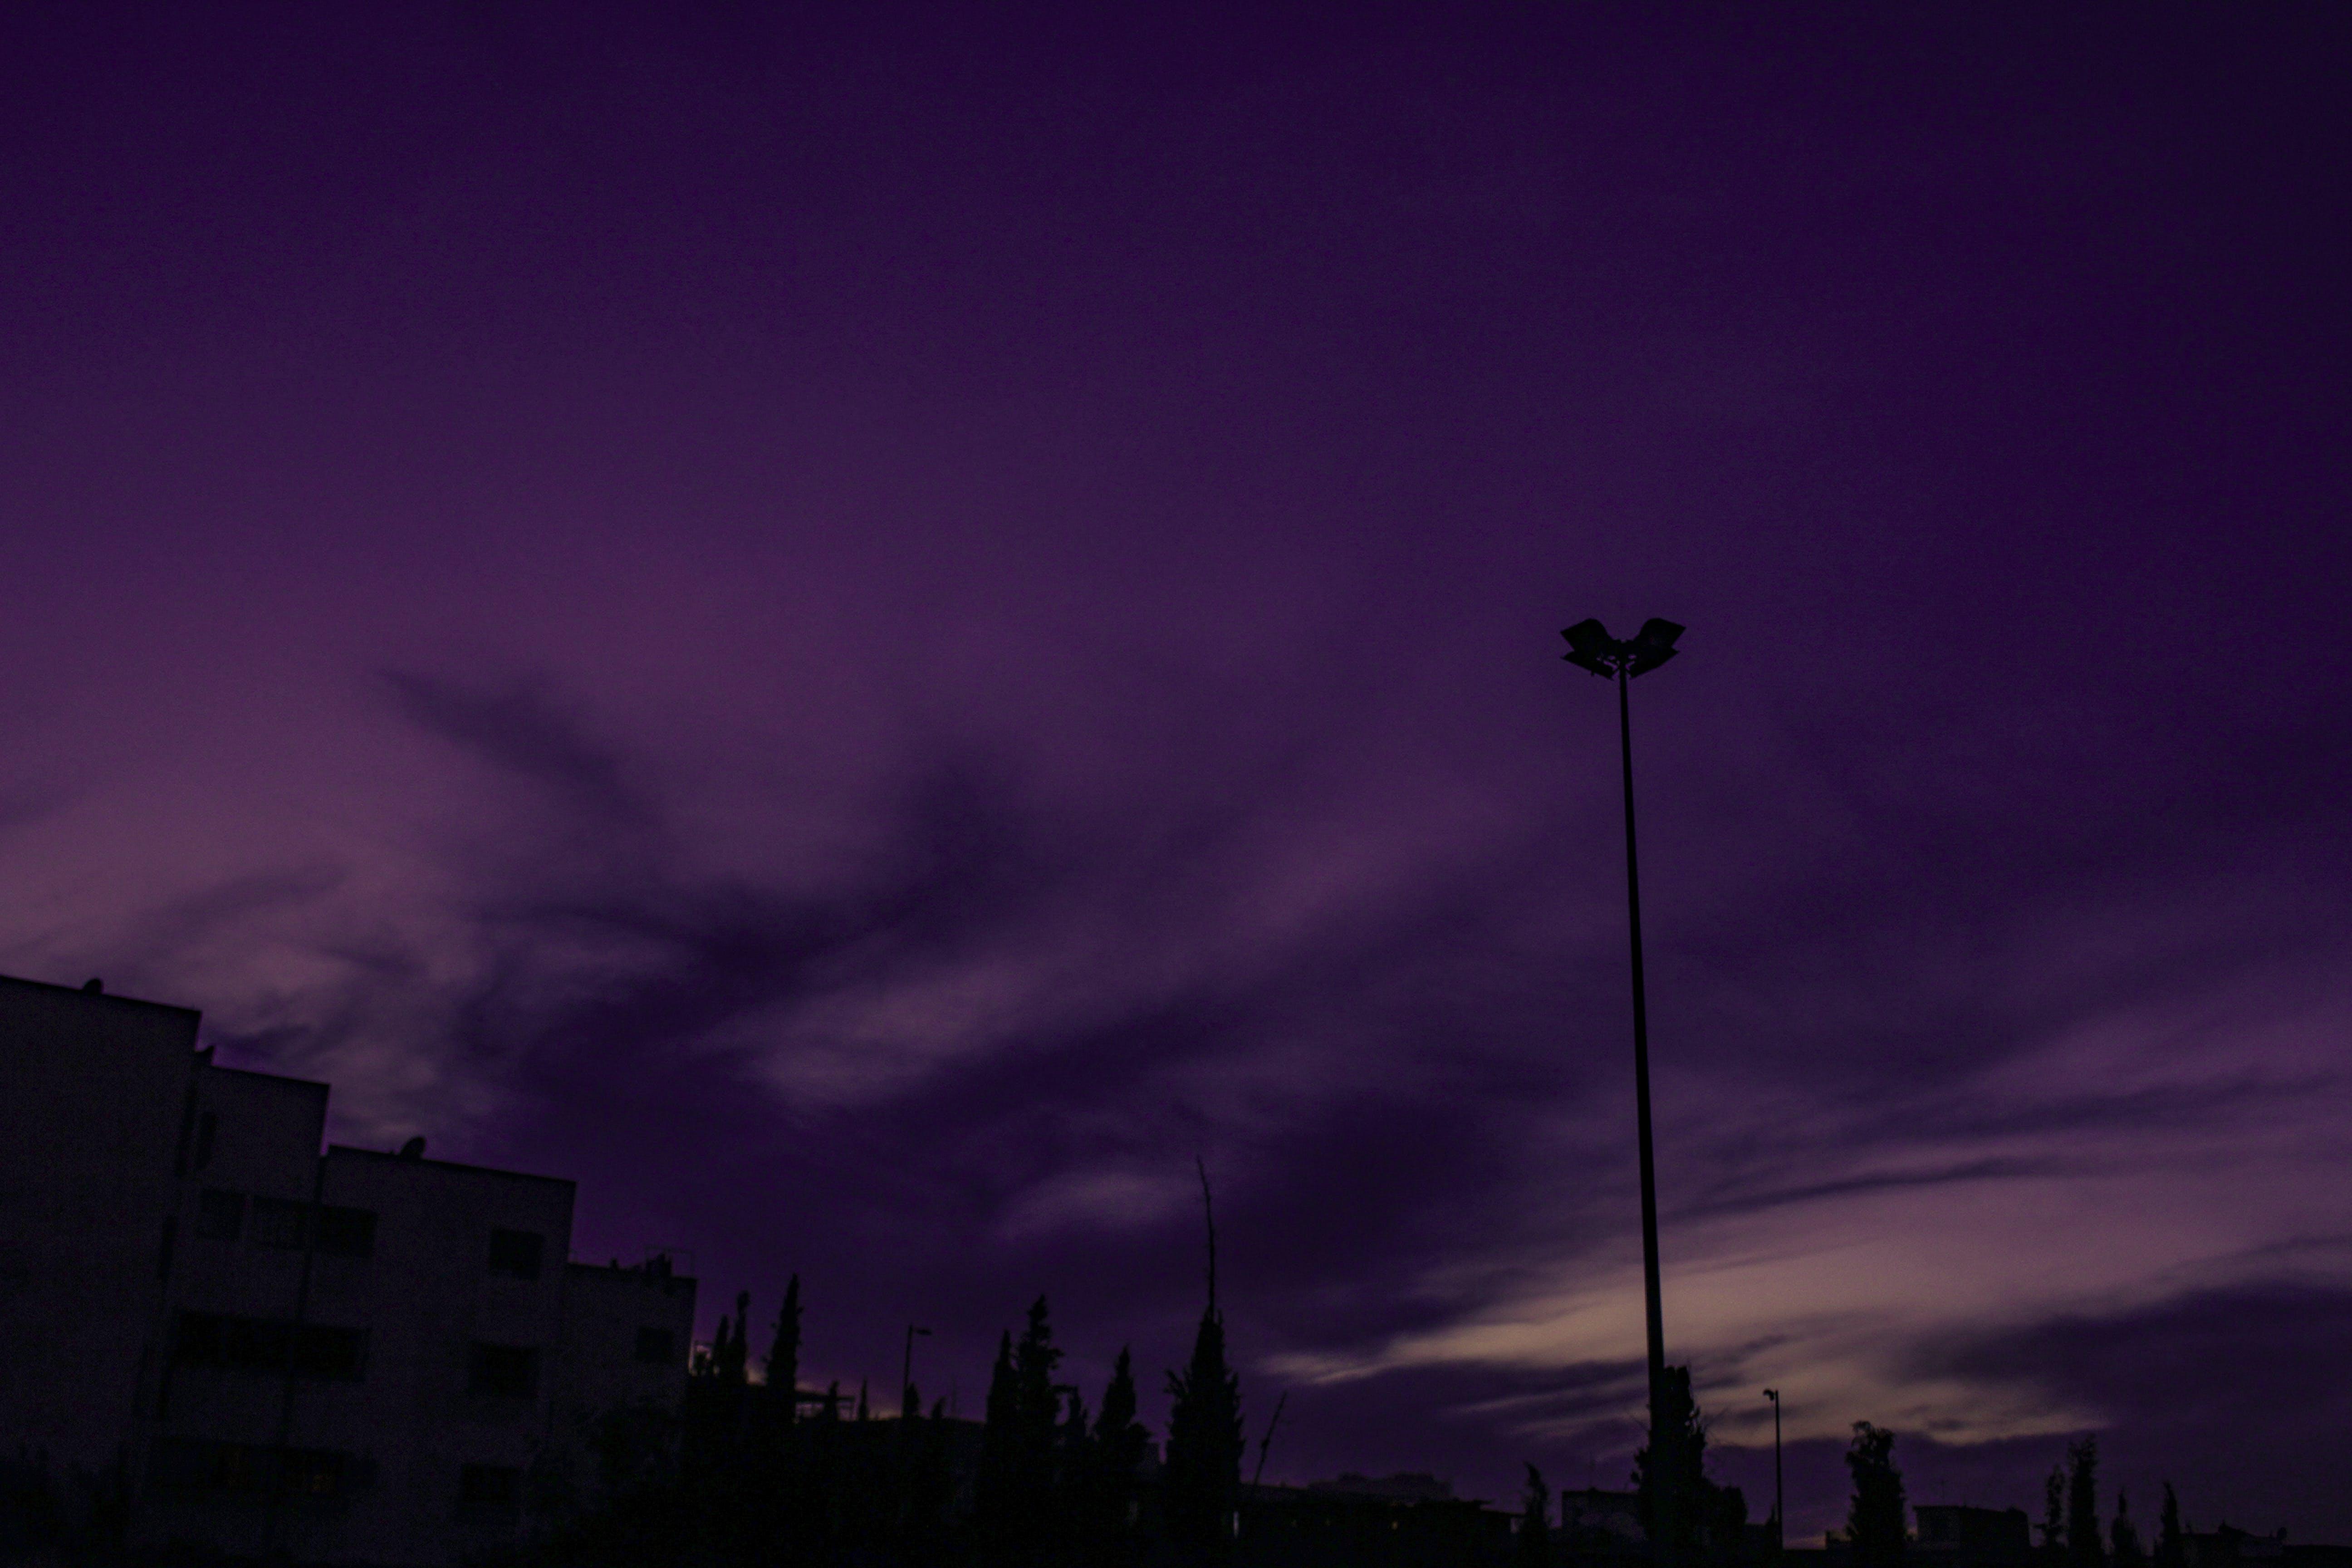 Kostenloses Stock Foto zu bewölkter himmel, dampf, dunkler himmel, lila